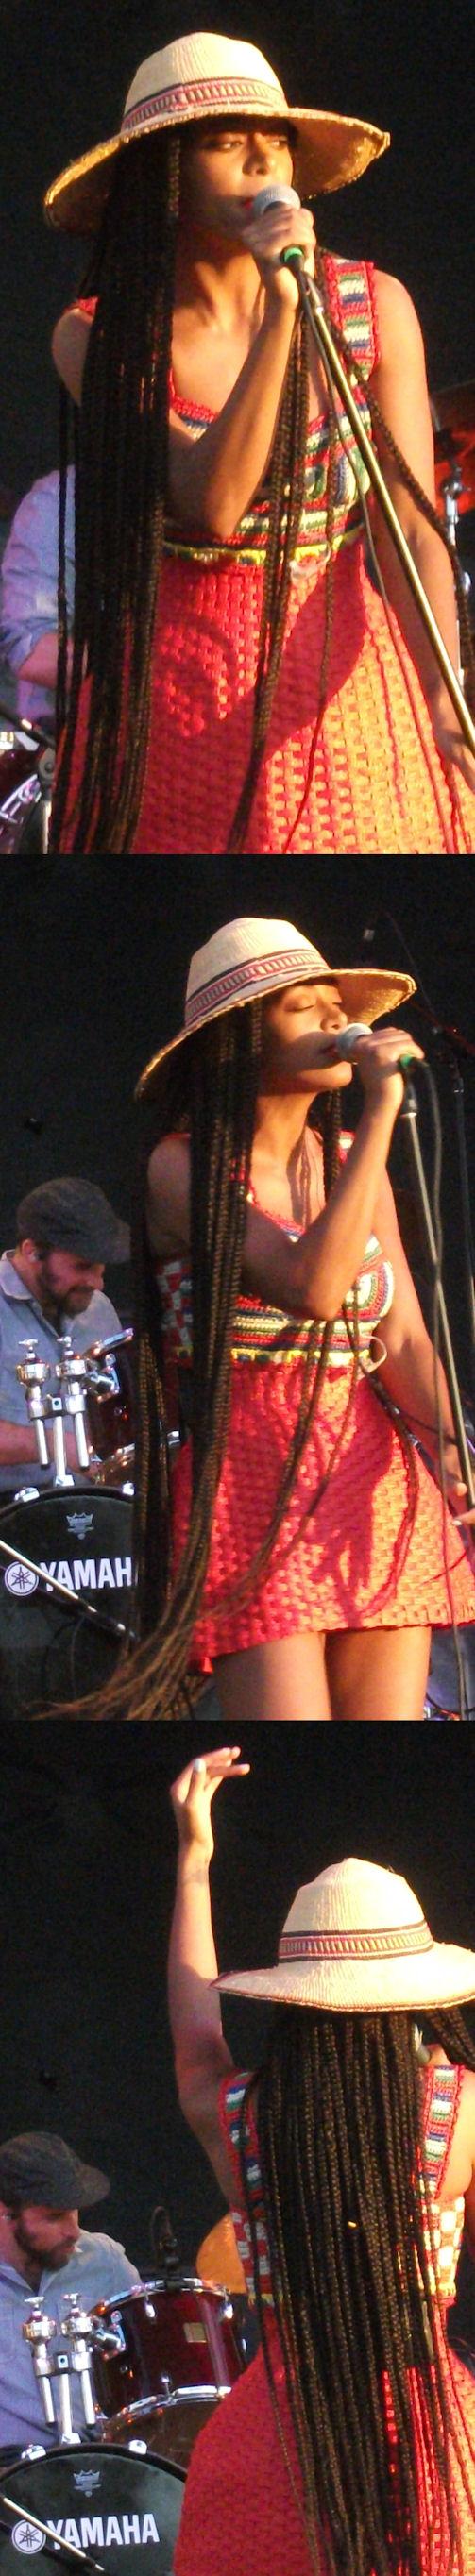 Solange Ottawa Bluesfest 2013 VariousArtists collage 2